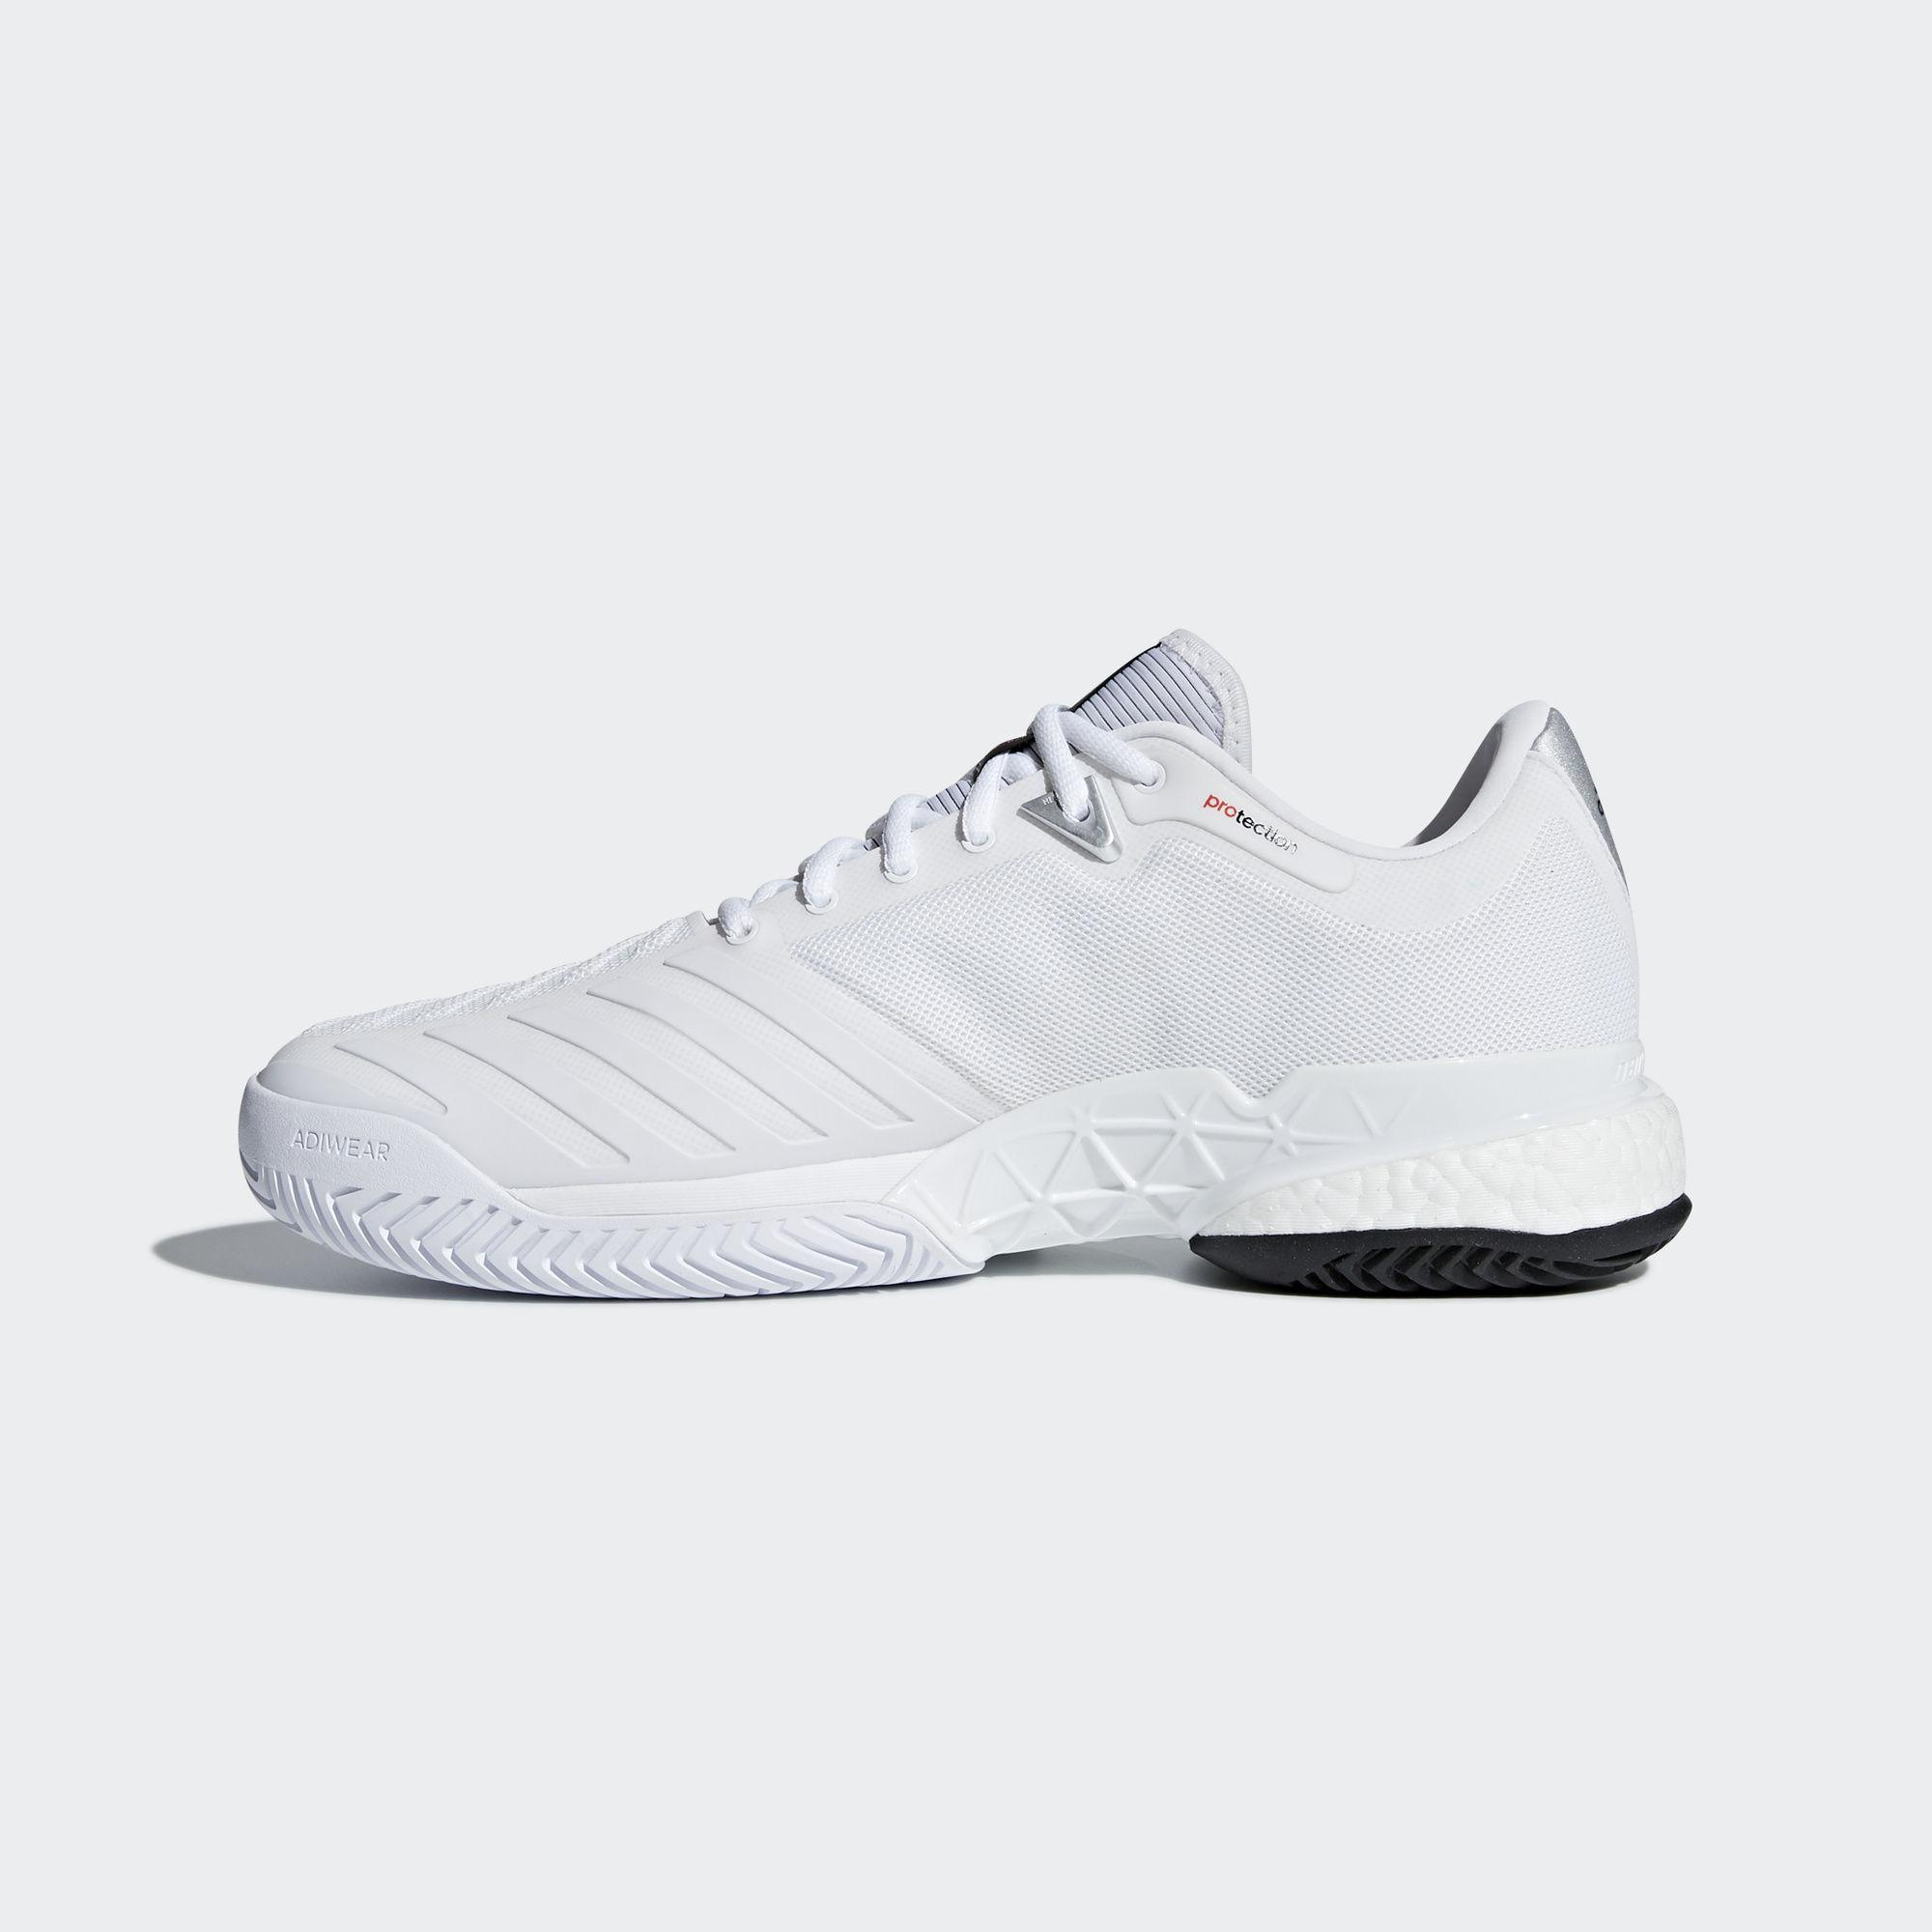 the latest 6d1b3 9c4b0 Adidas Mens Barricade Boost 2018 Tennis Shoes - WhiteSilver